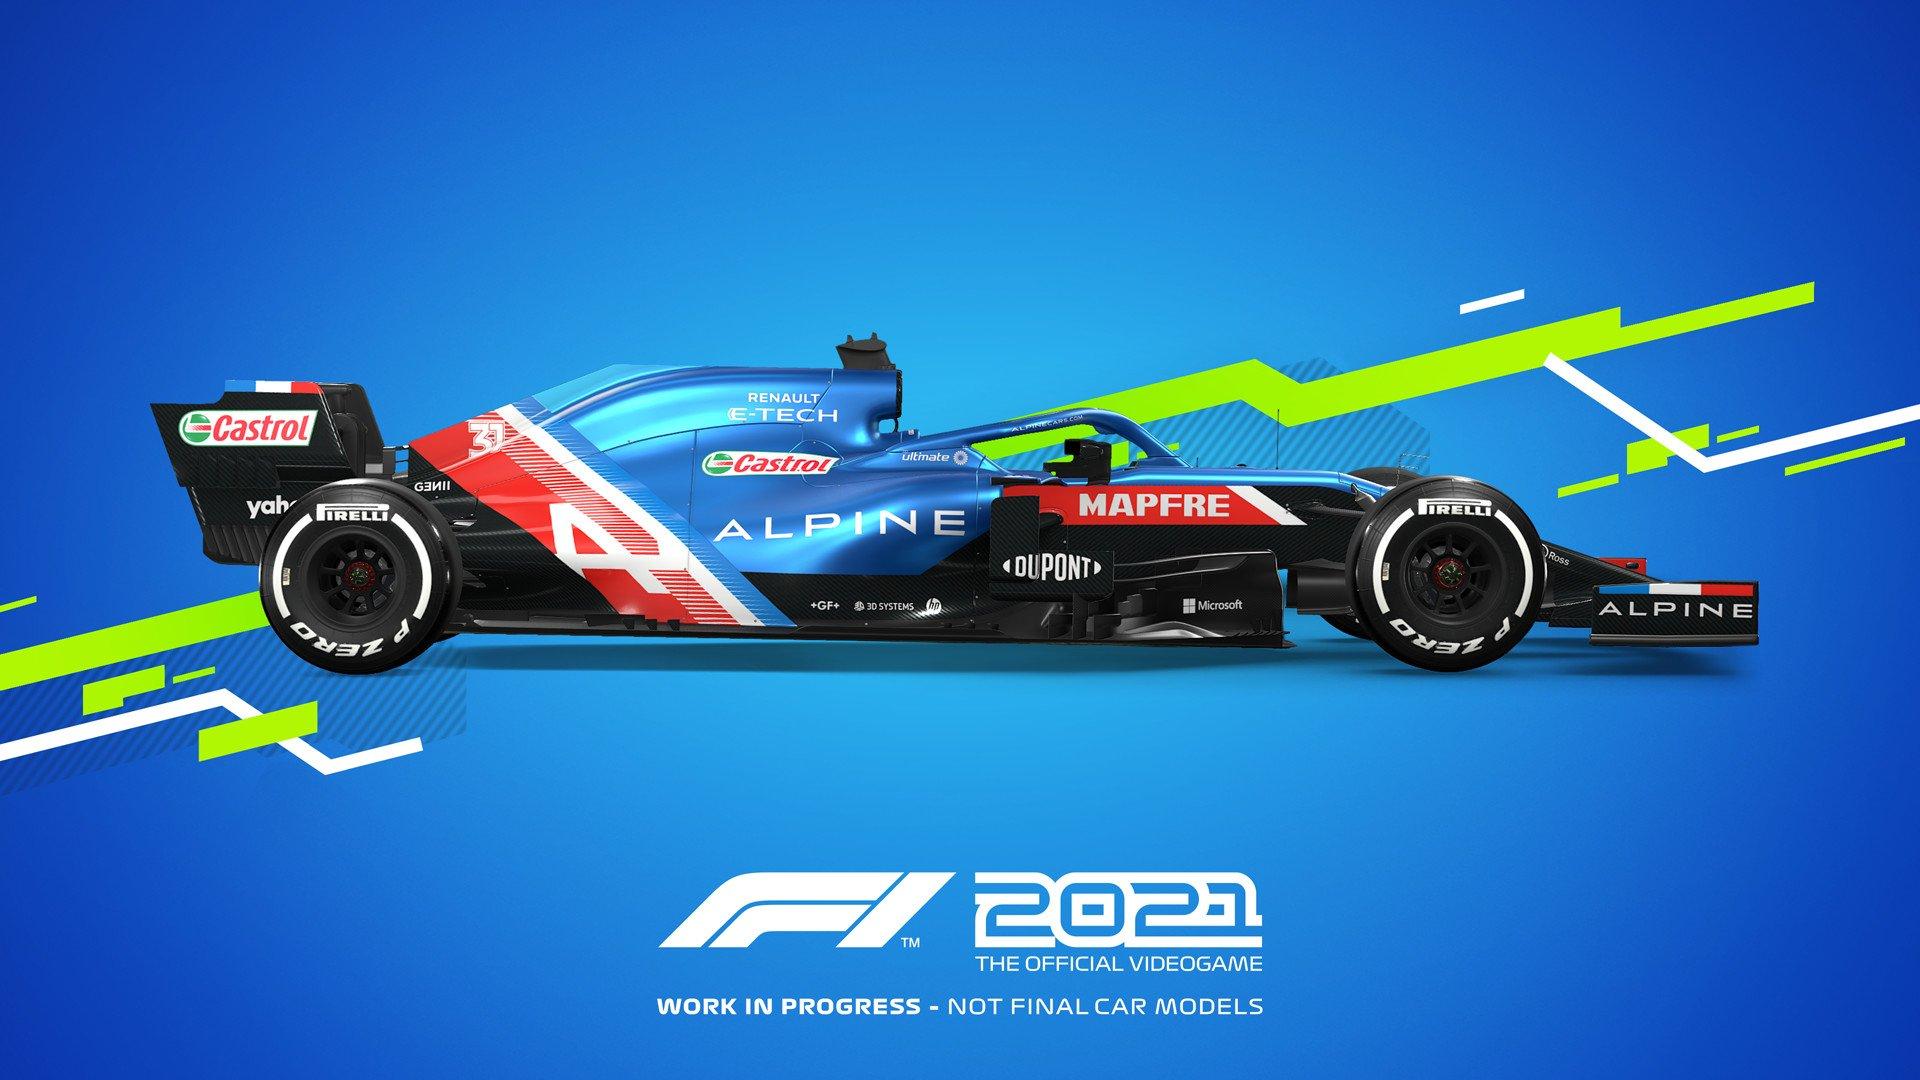 Acheter F1 2021 - PS4/5 Digital Code   Playstation Network